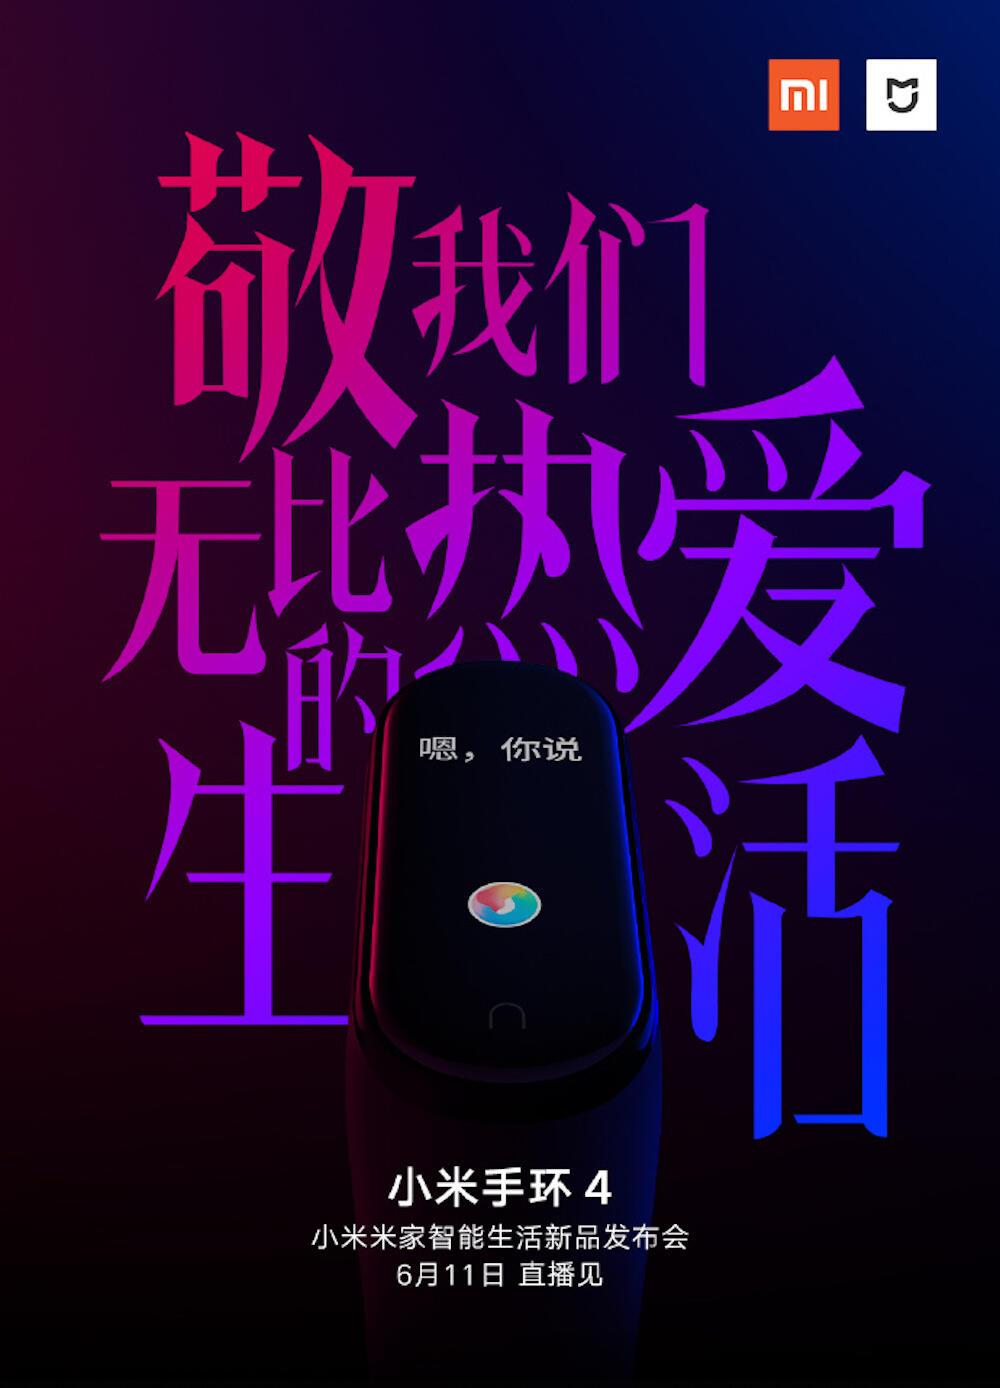 Xiaomi Mi Band 4 Event